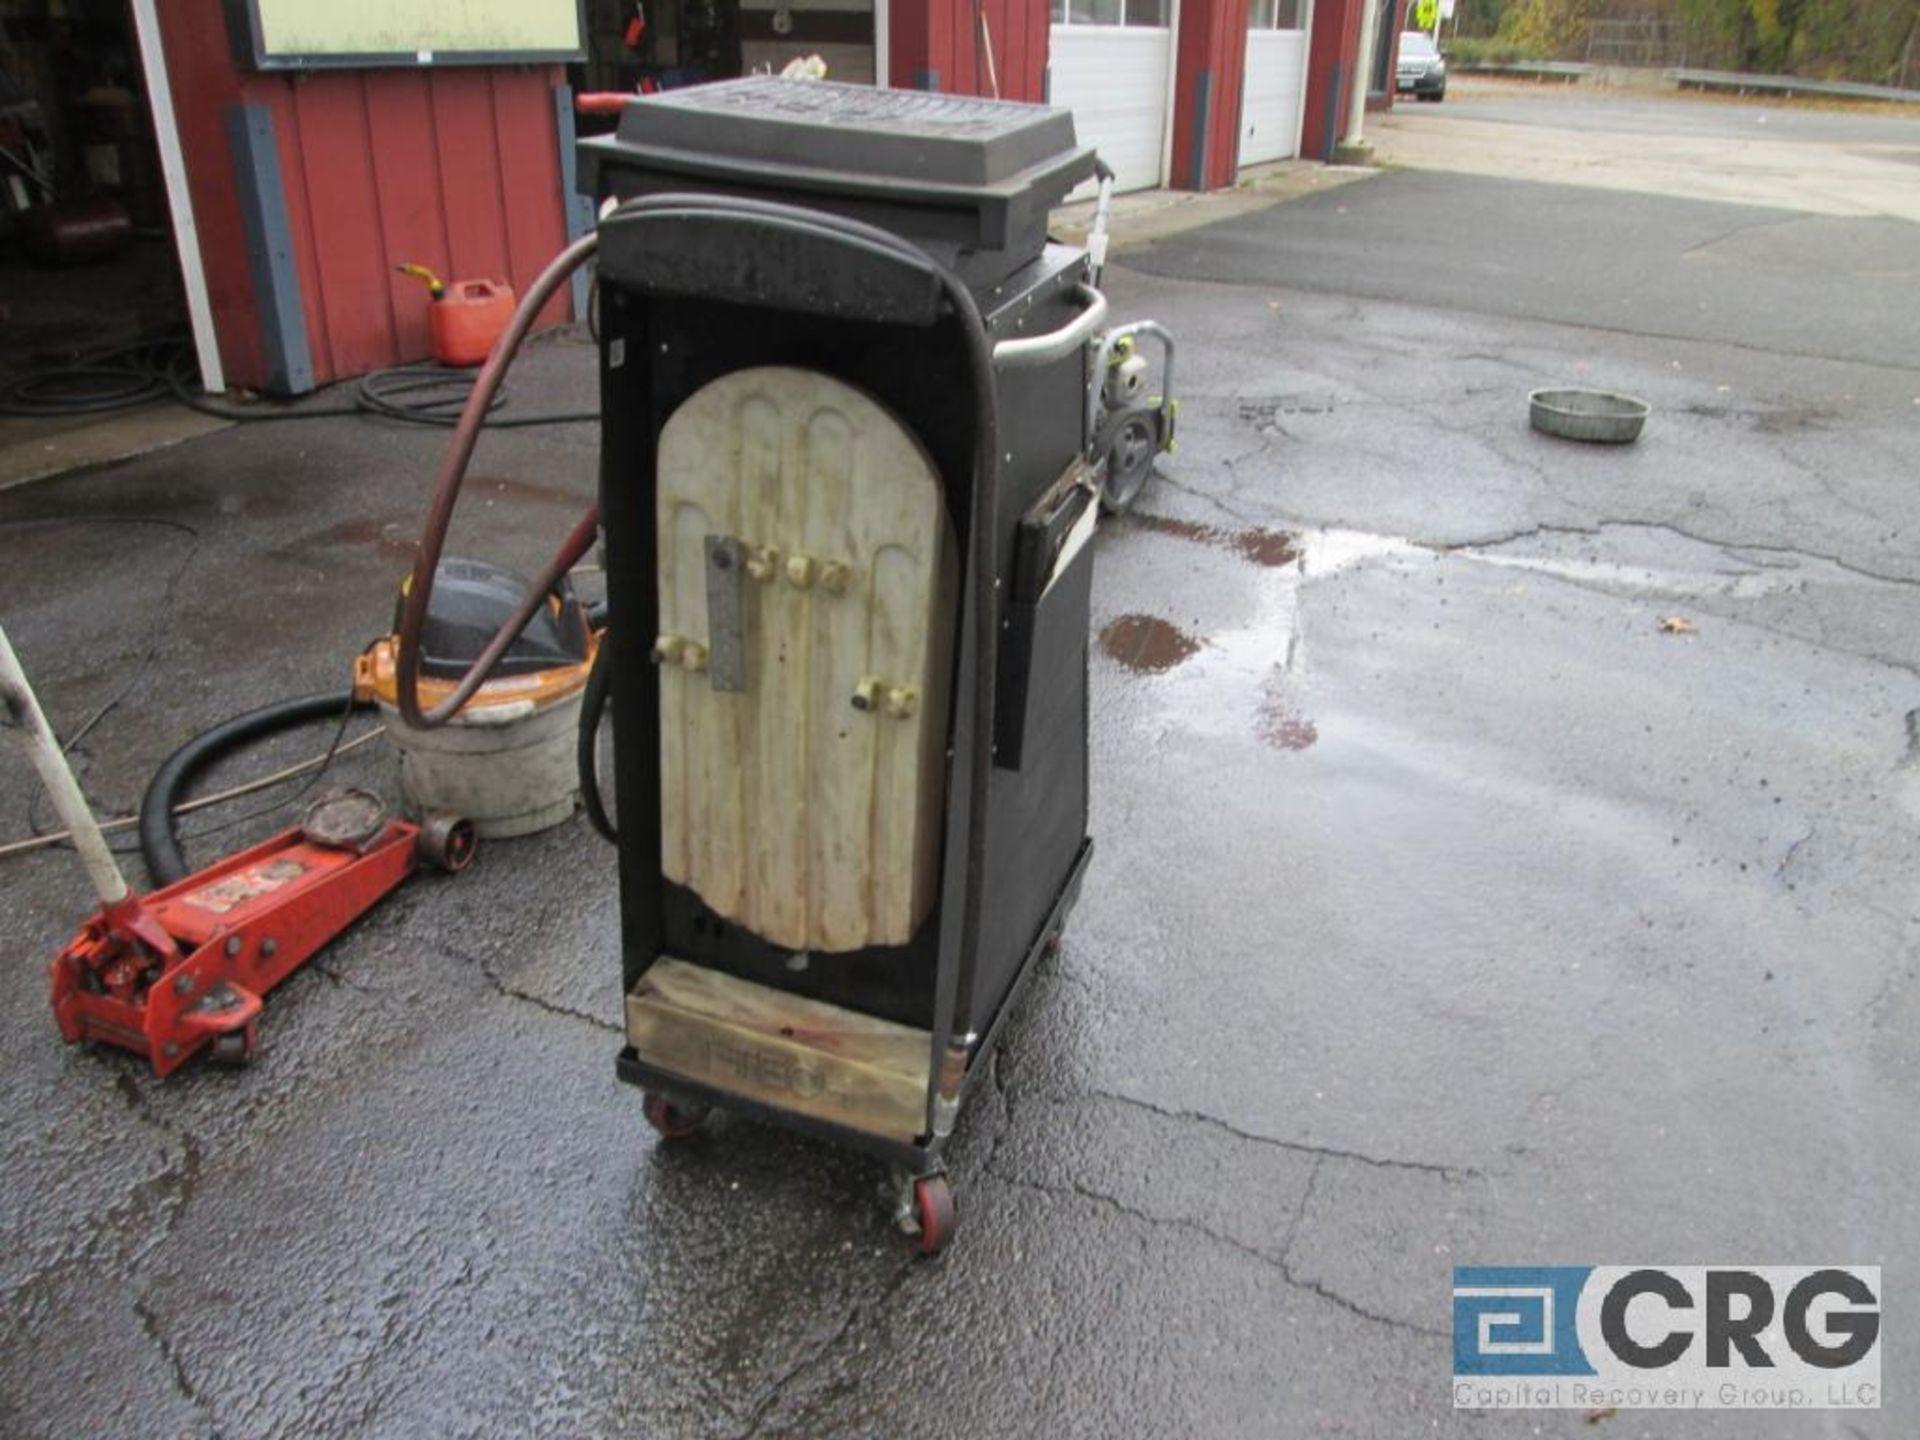 T-Tech Transmission Service Technology transmission flushing machine, portable, 115V, 1 ph - Image 3 of 3